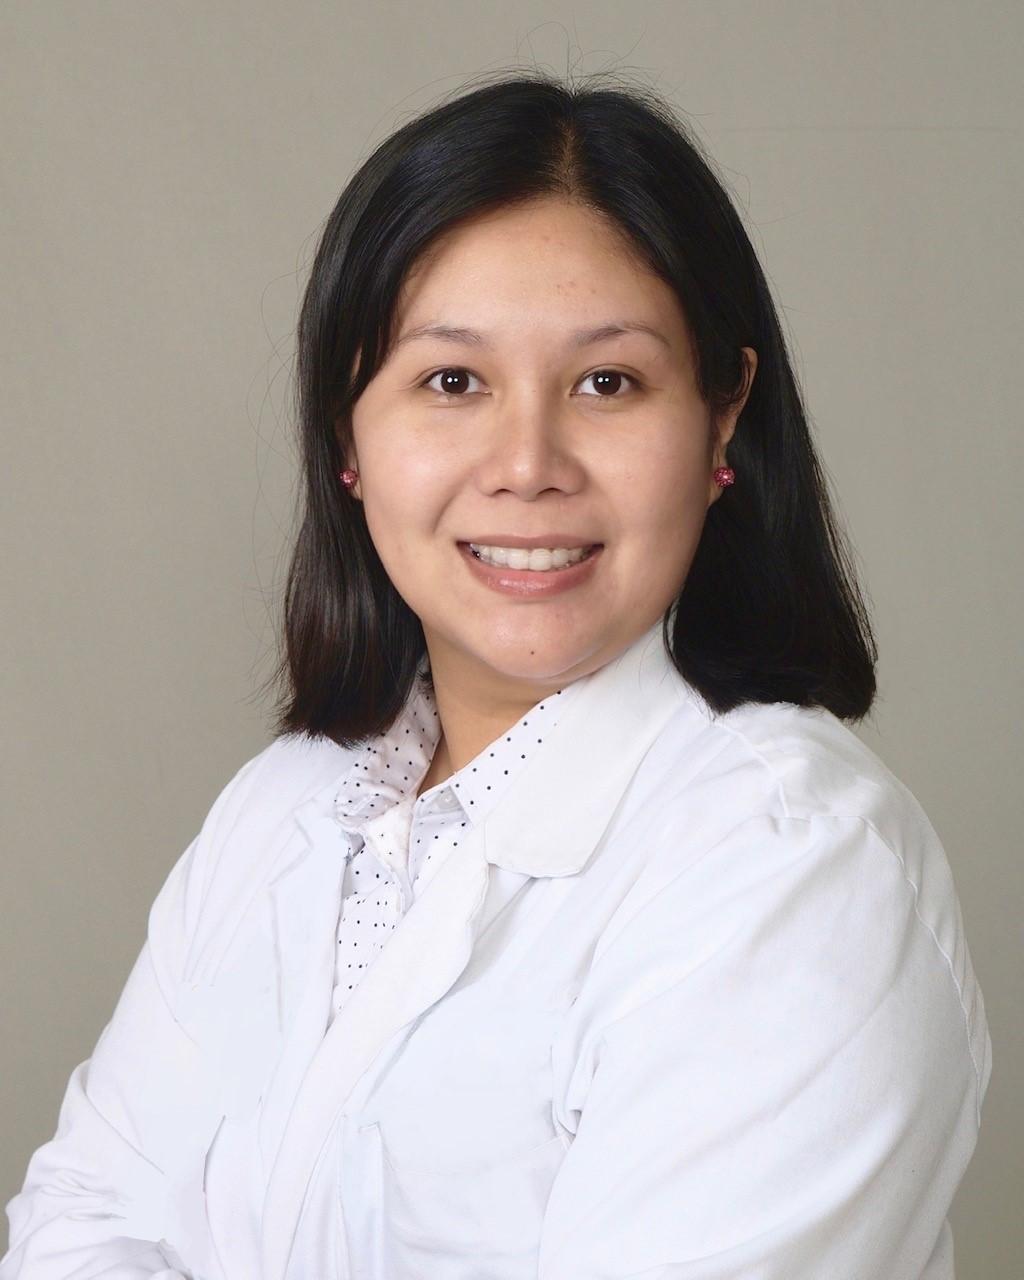 Pwint P. Phyu, M.D.